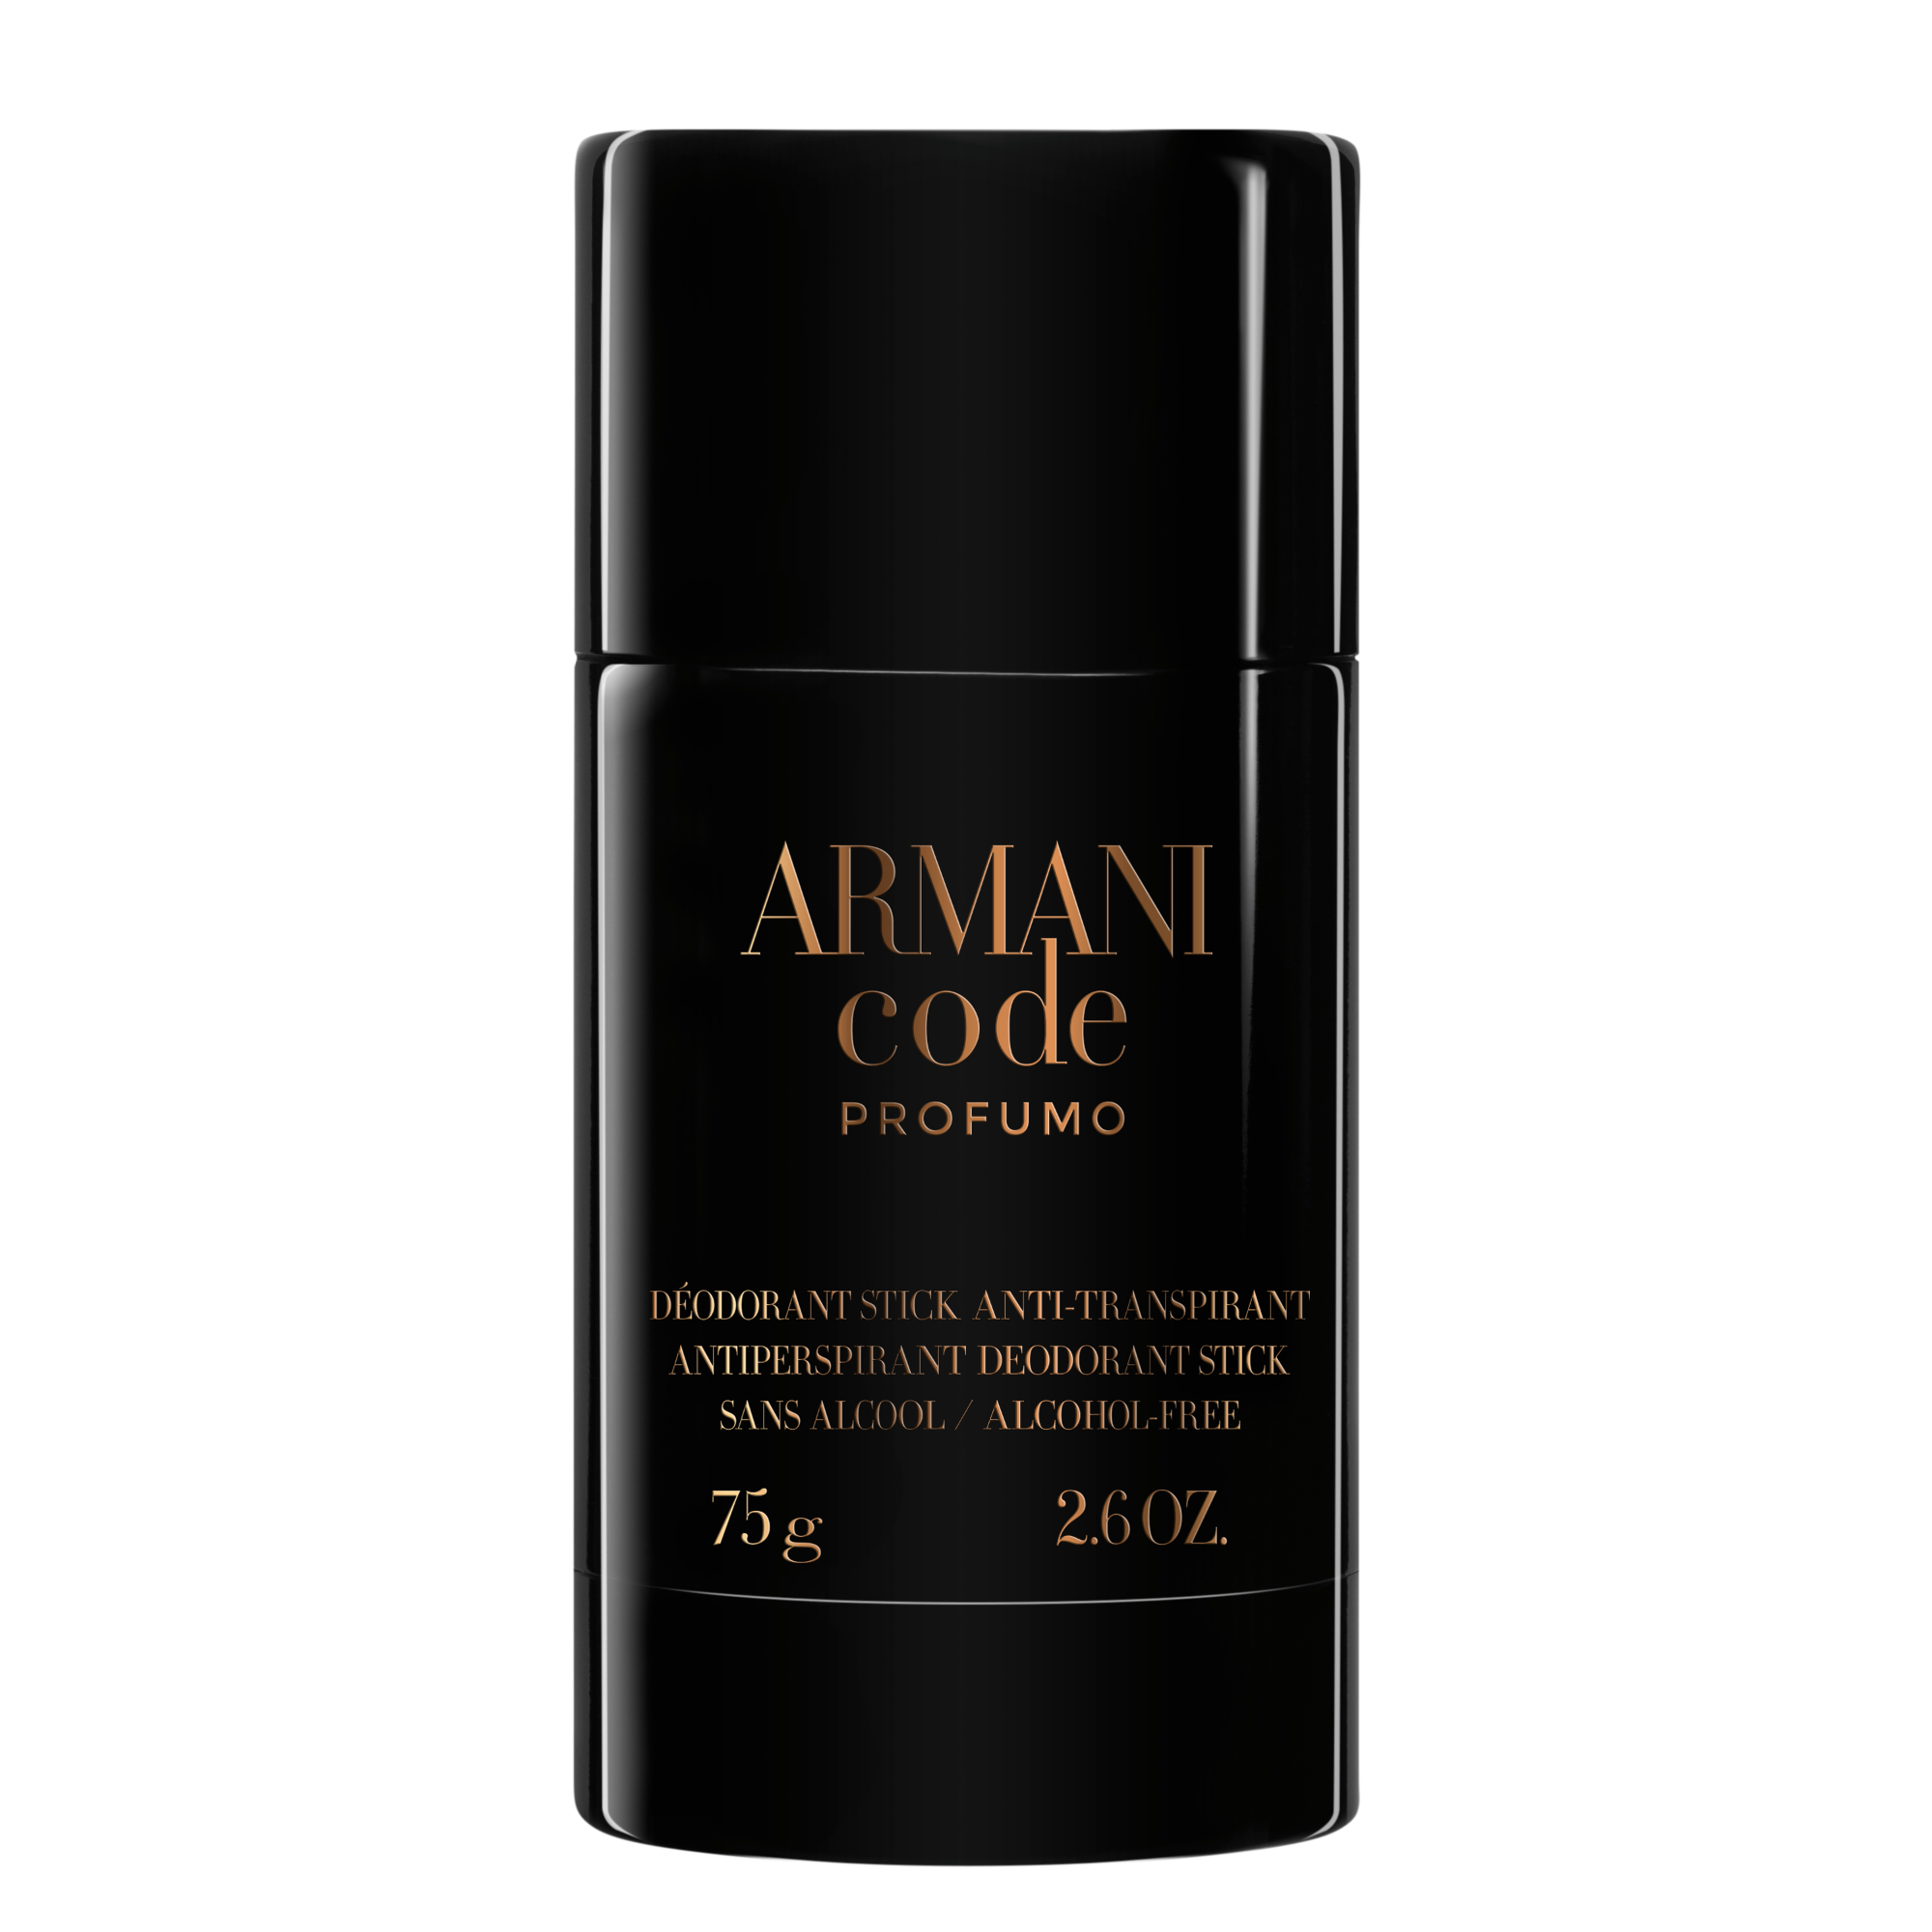 Armani Code Profumo Deostick 75g